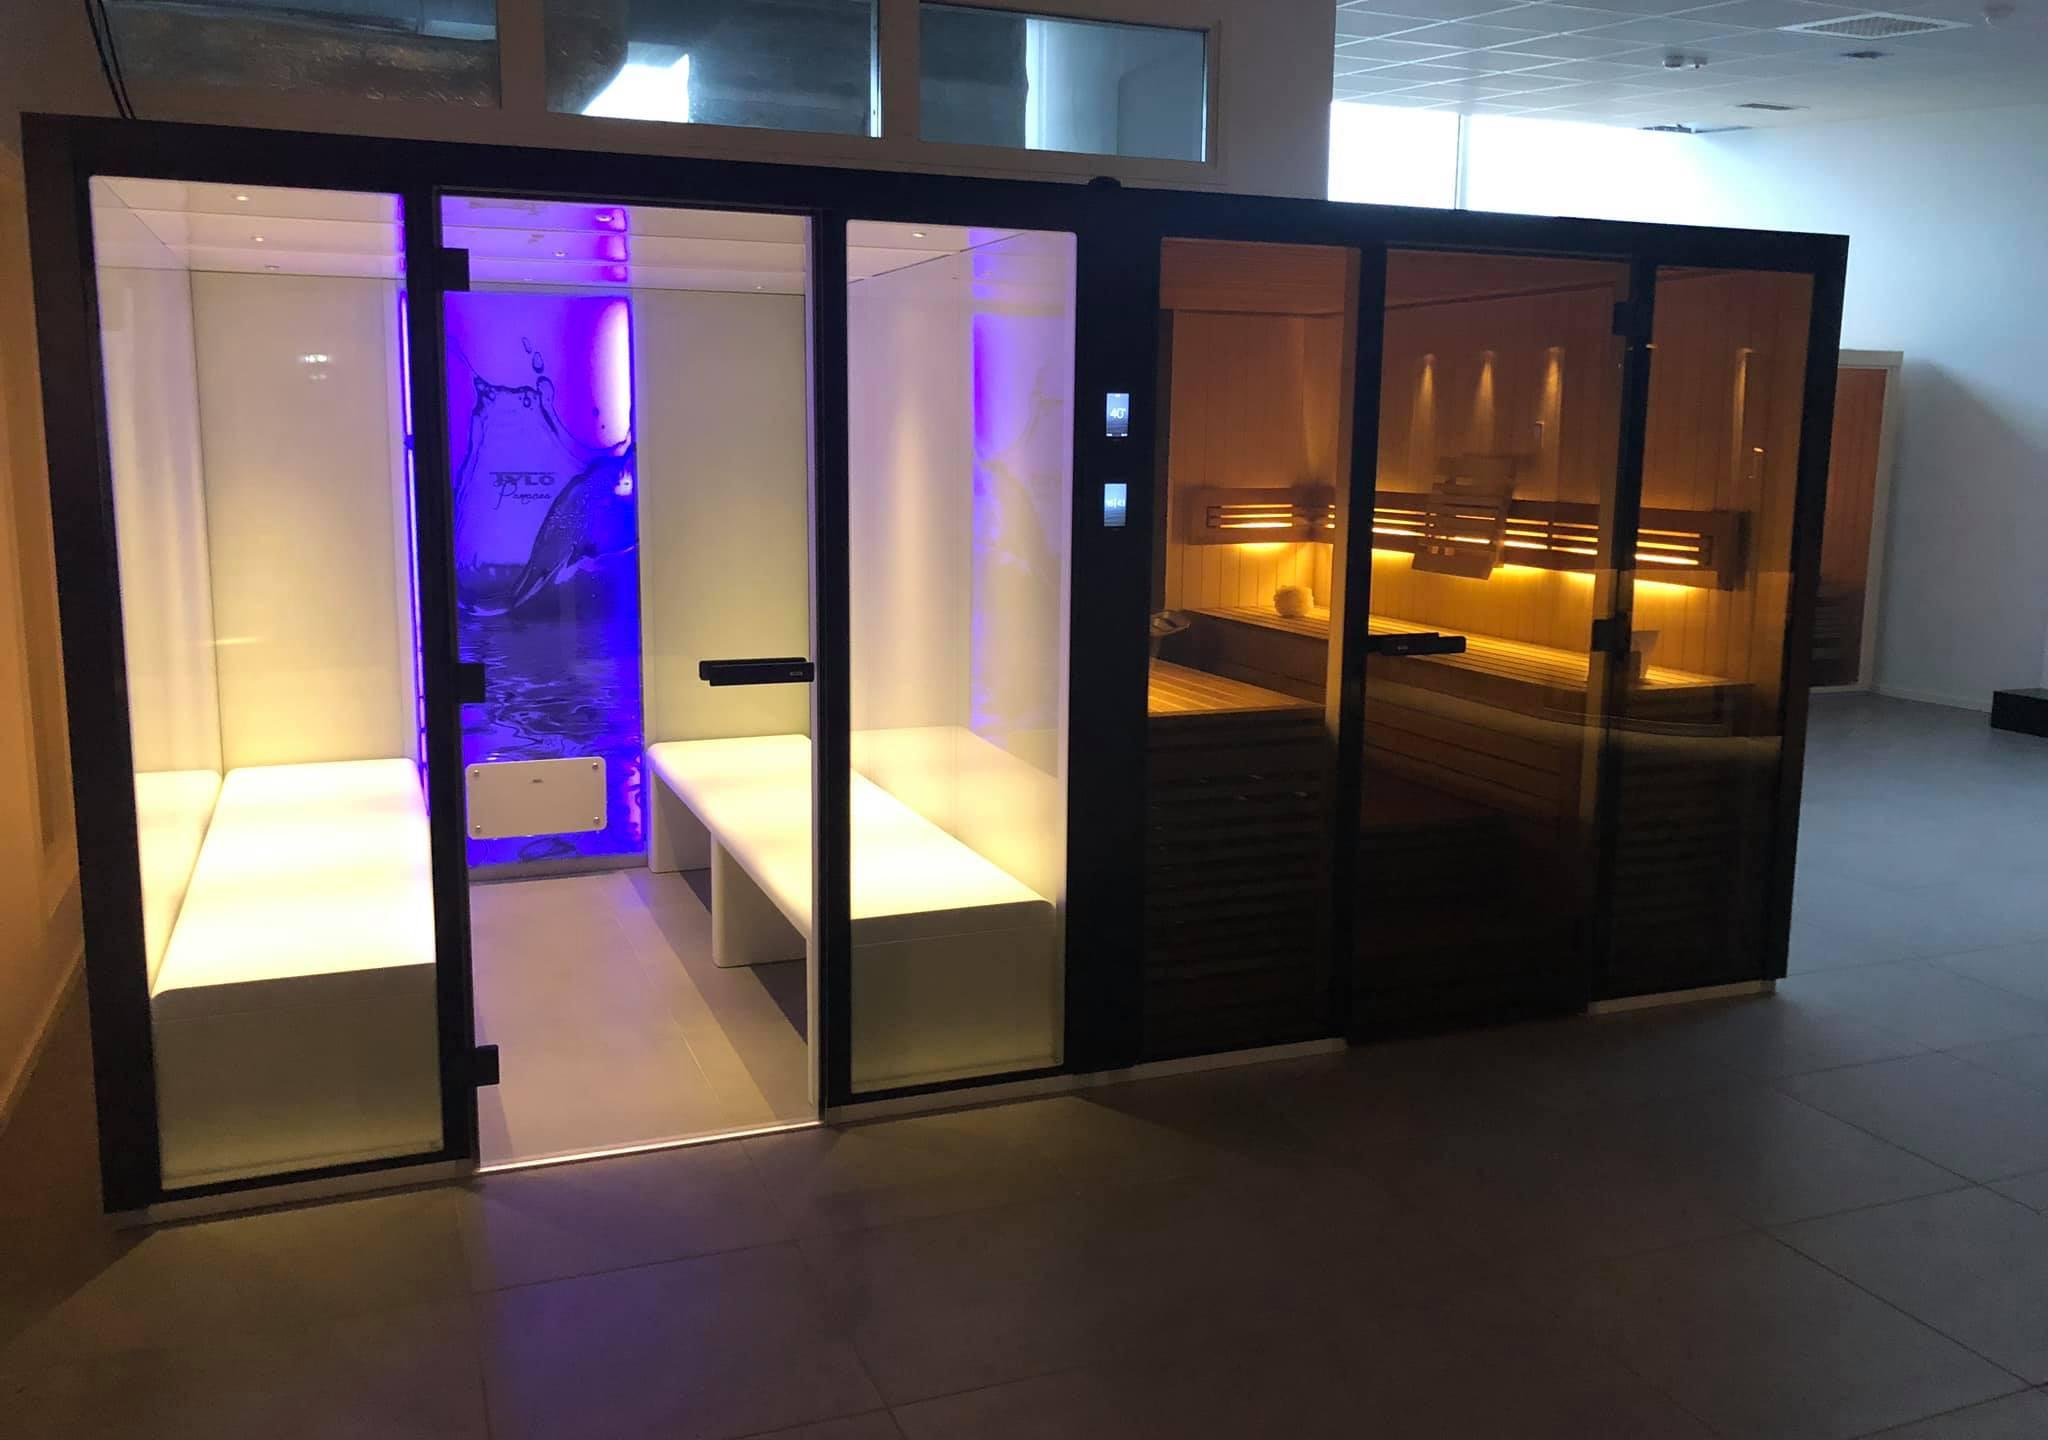 TyloHelo Panacea Steam Room & Sauna